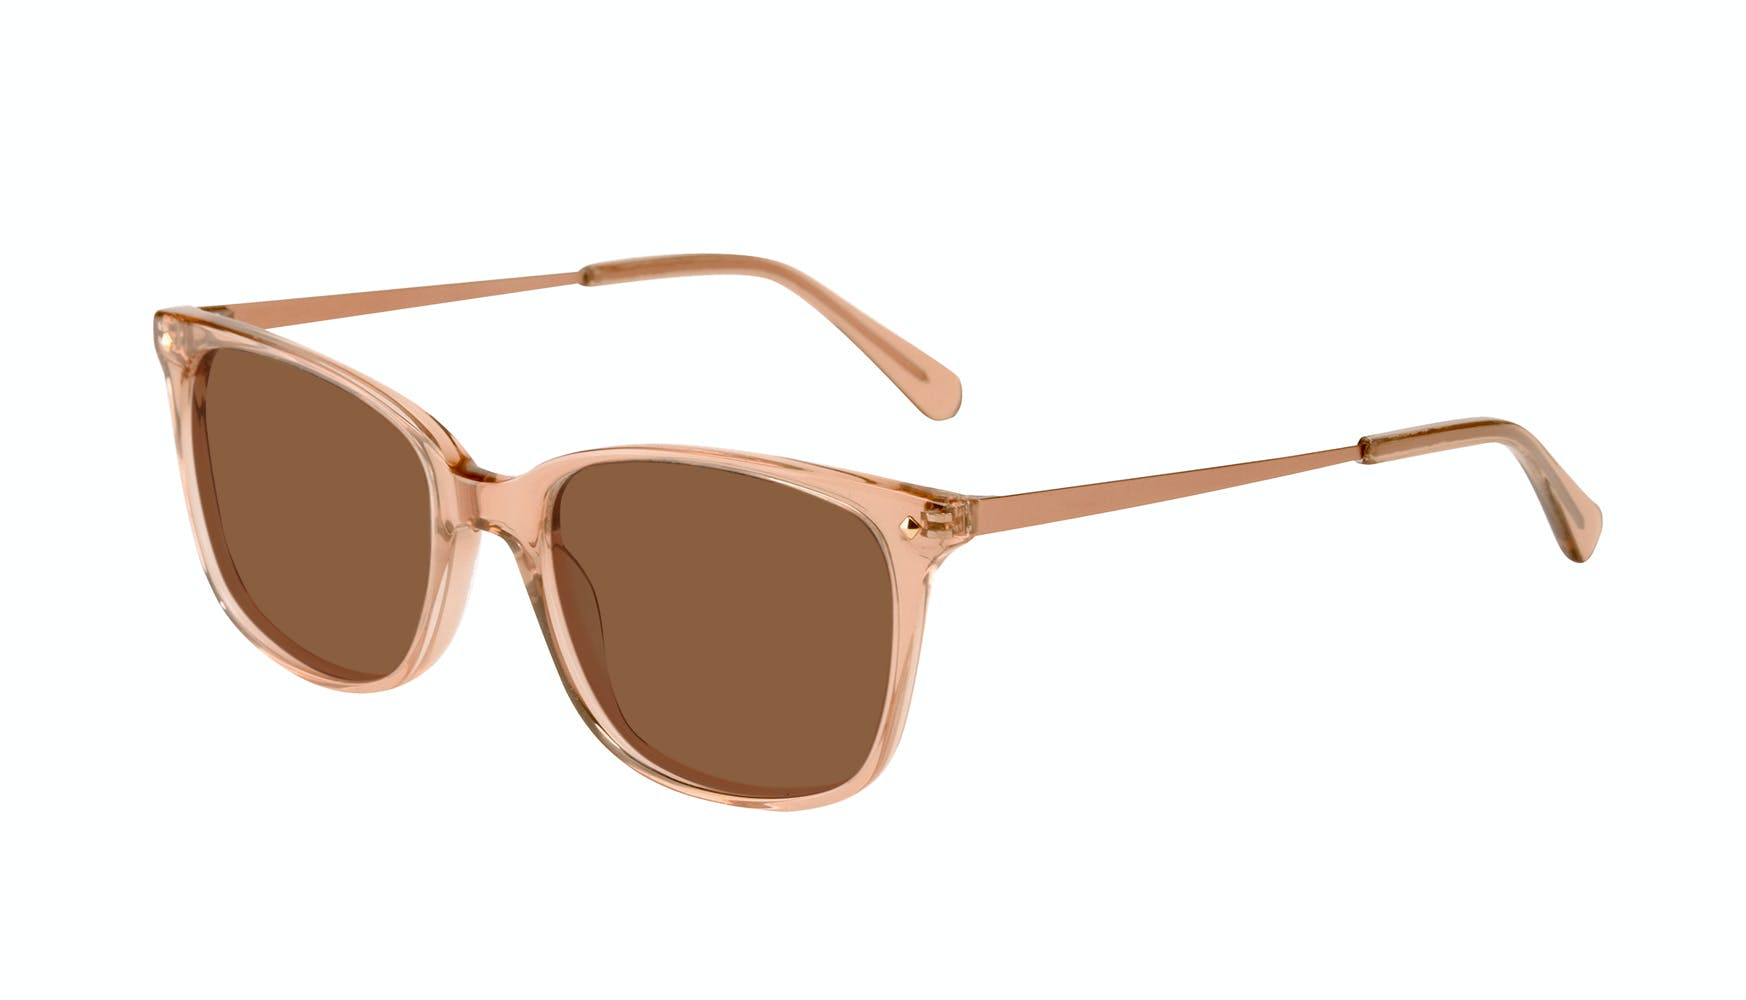 Affordable Fashion Glasses Rectangle Square Sunglasses Women Refine Toffee Tilt